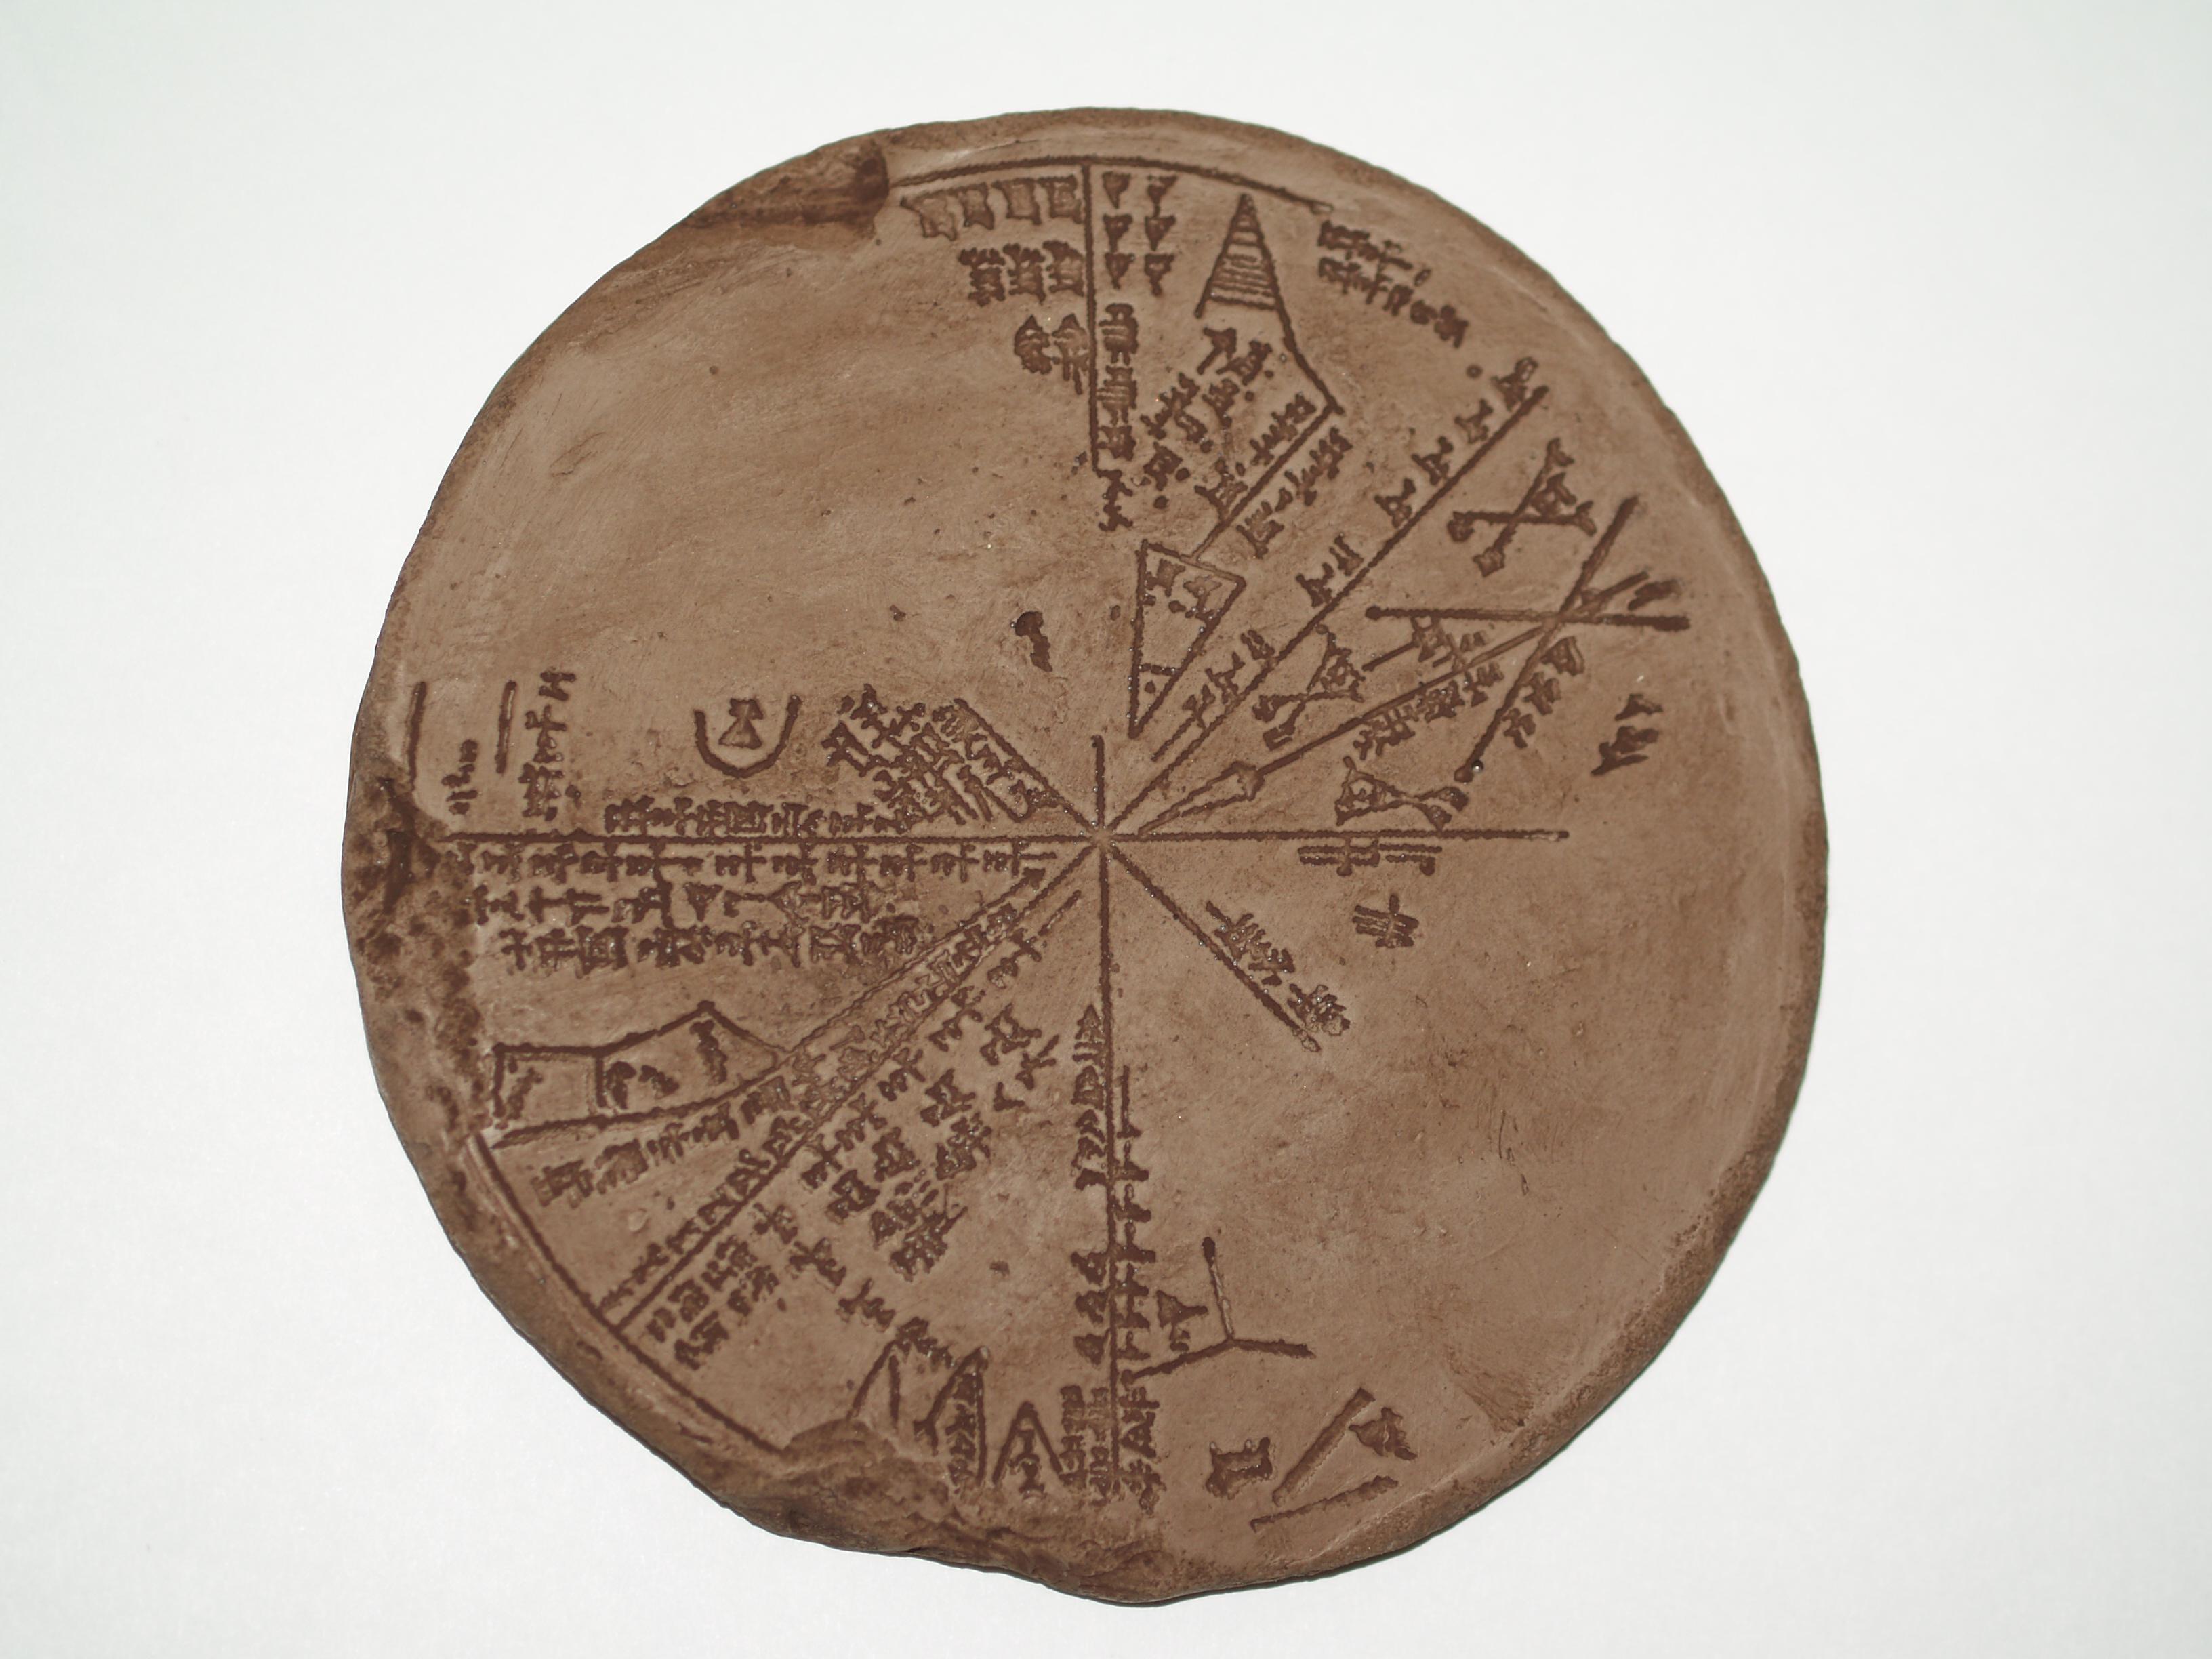 Sumerian star map or plaisphere ca 650